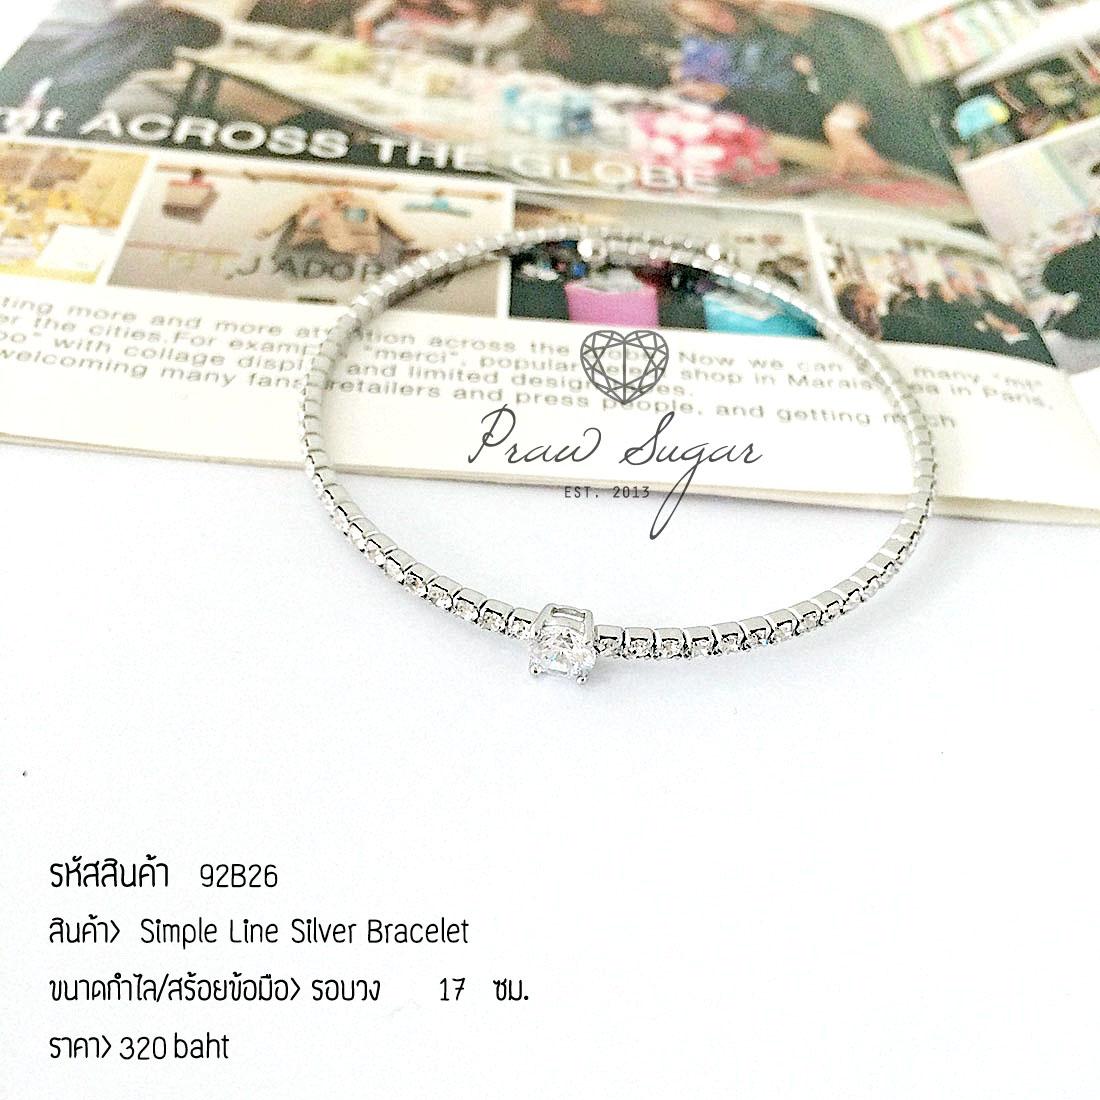 Simple Line Silver Bracelet